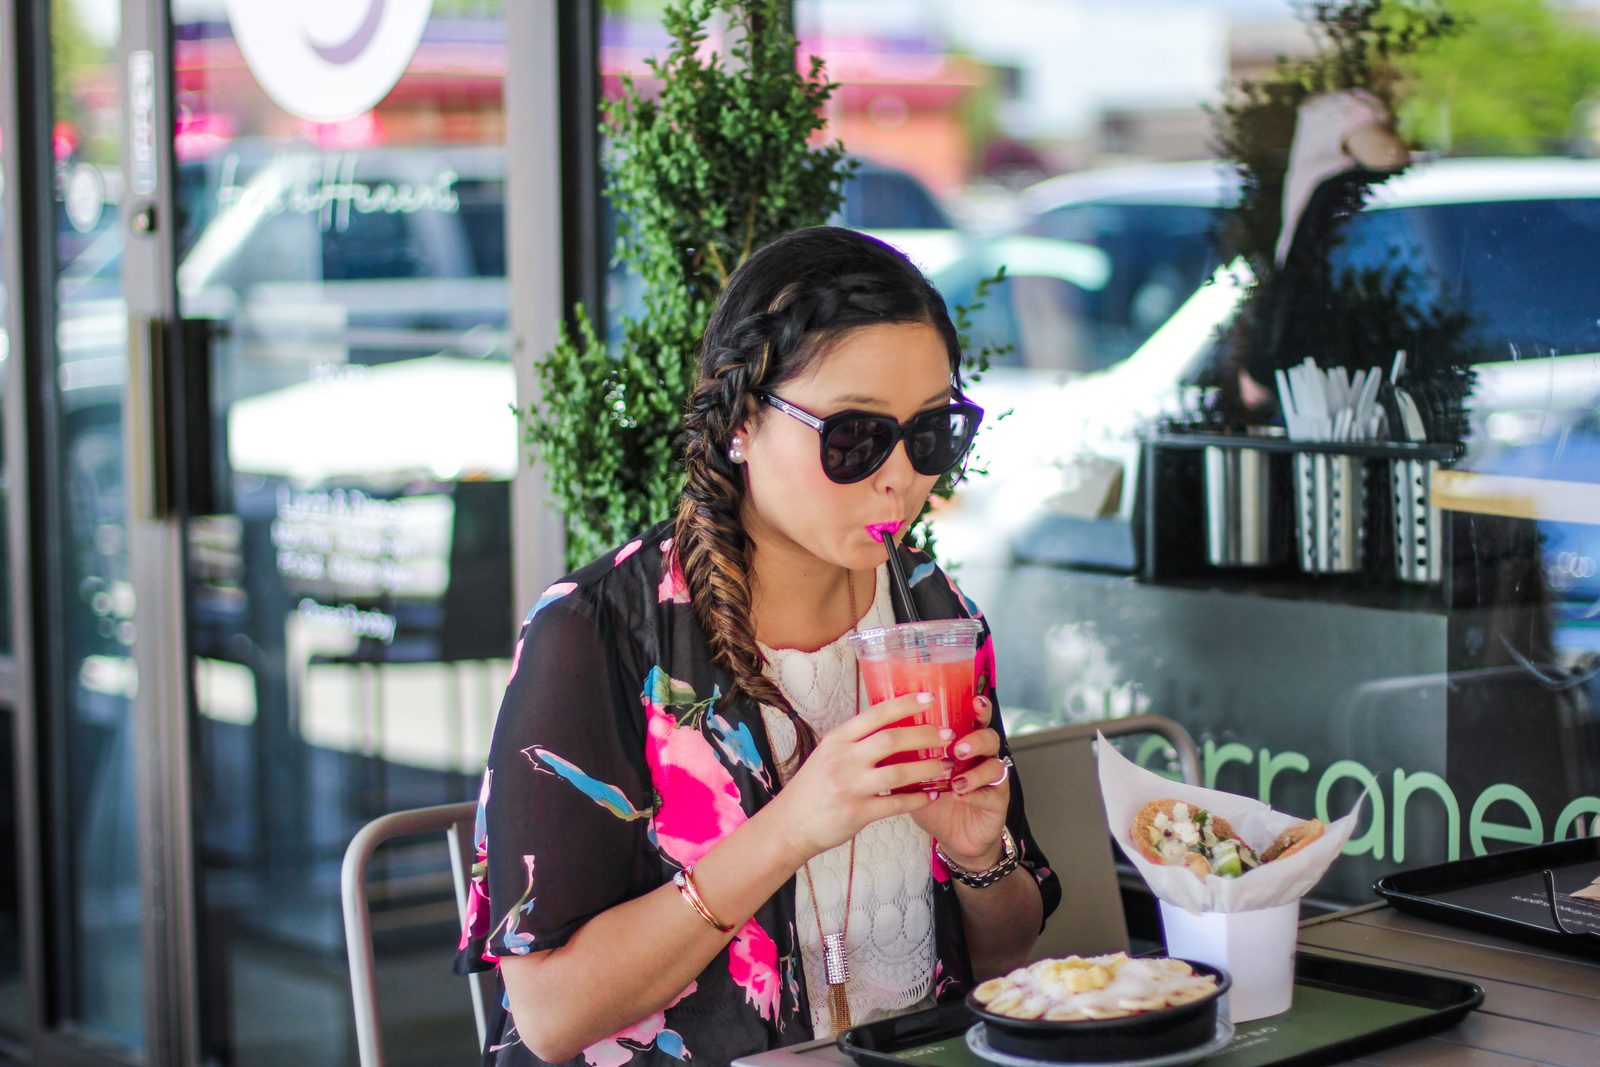 Sandy a la Mode | Utah Local Love List - Aubergine and Company in Orem, UT